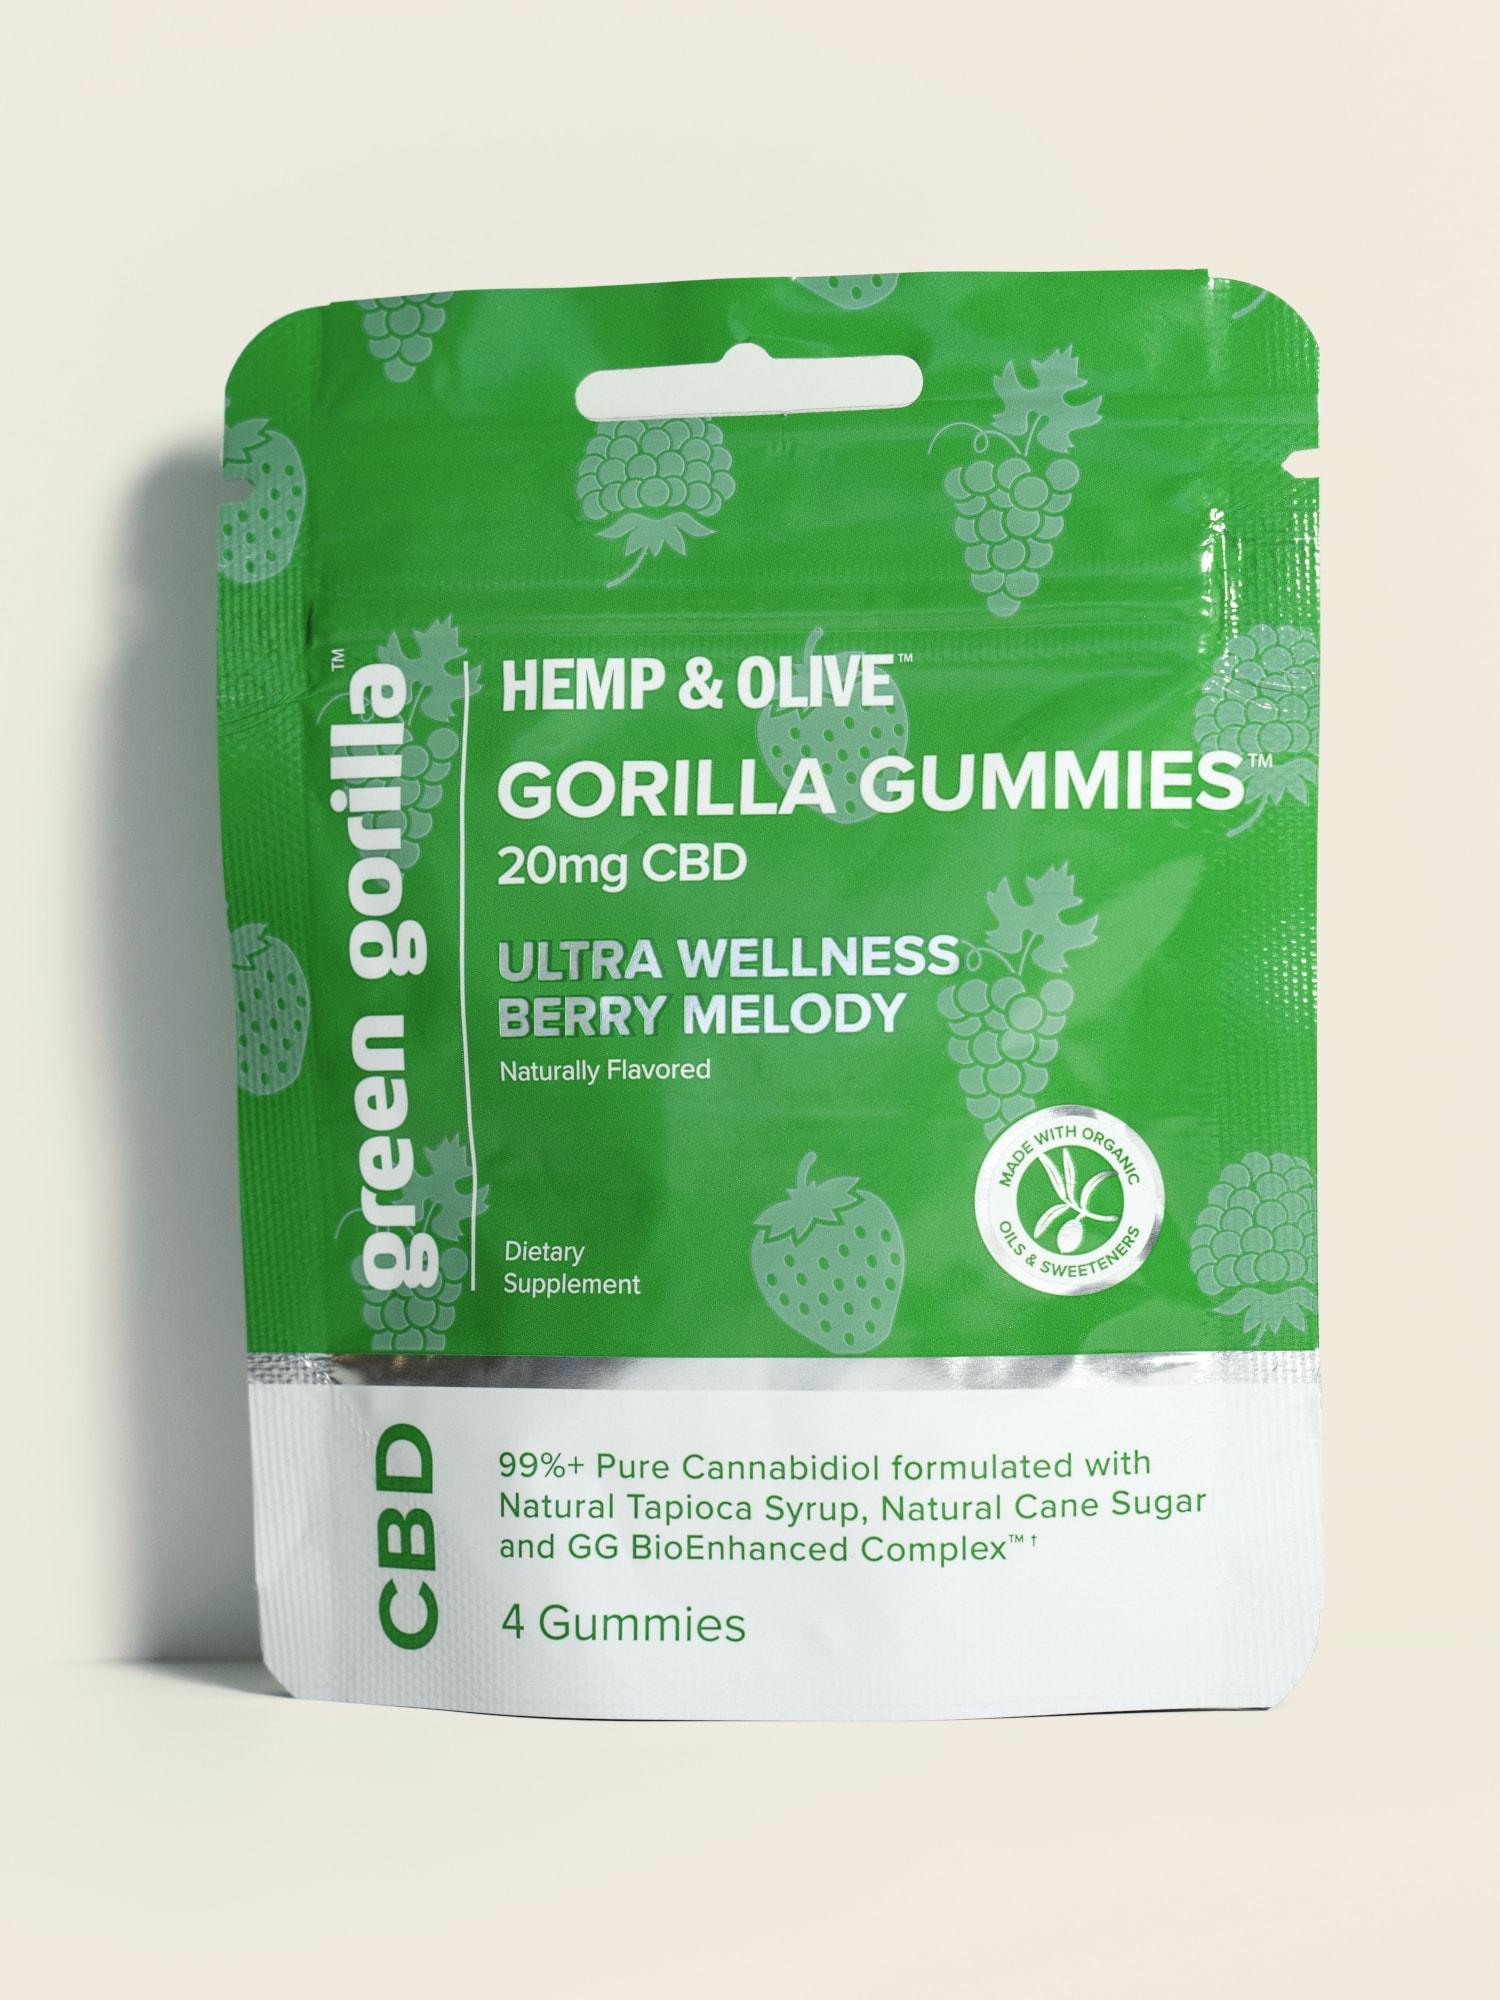 Pure CBD Infused Gorilla Gummies Organic CBD Chewables Travel Size - 20mg